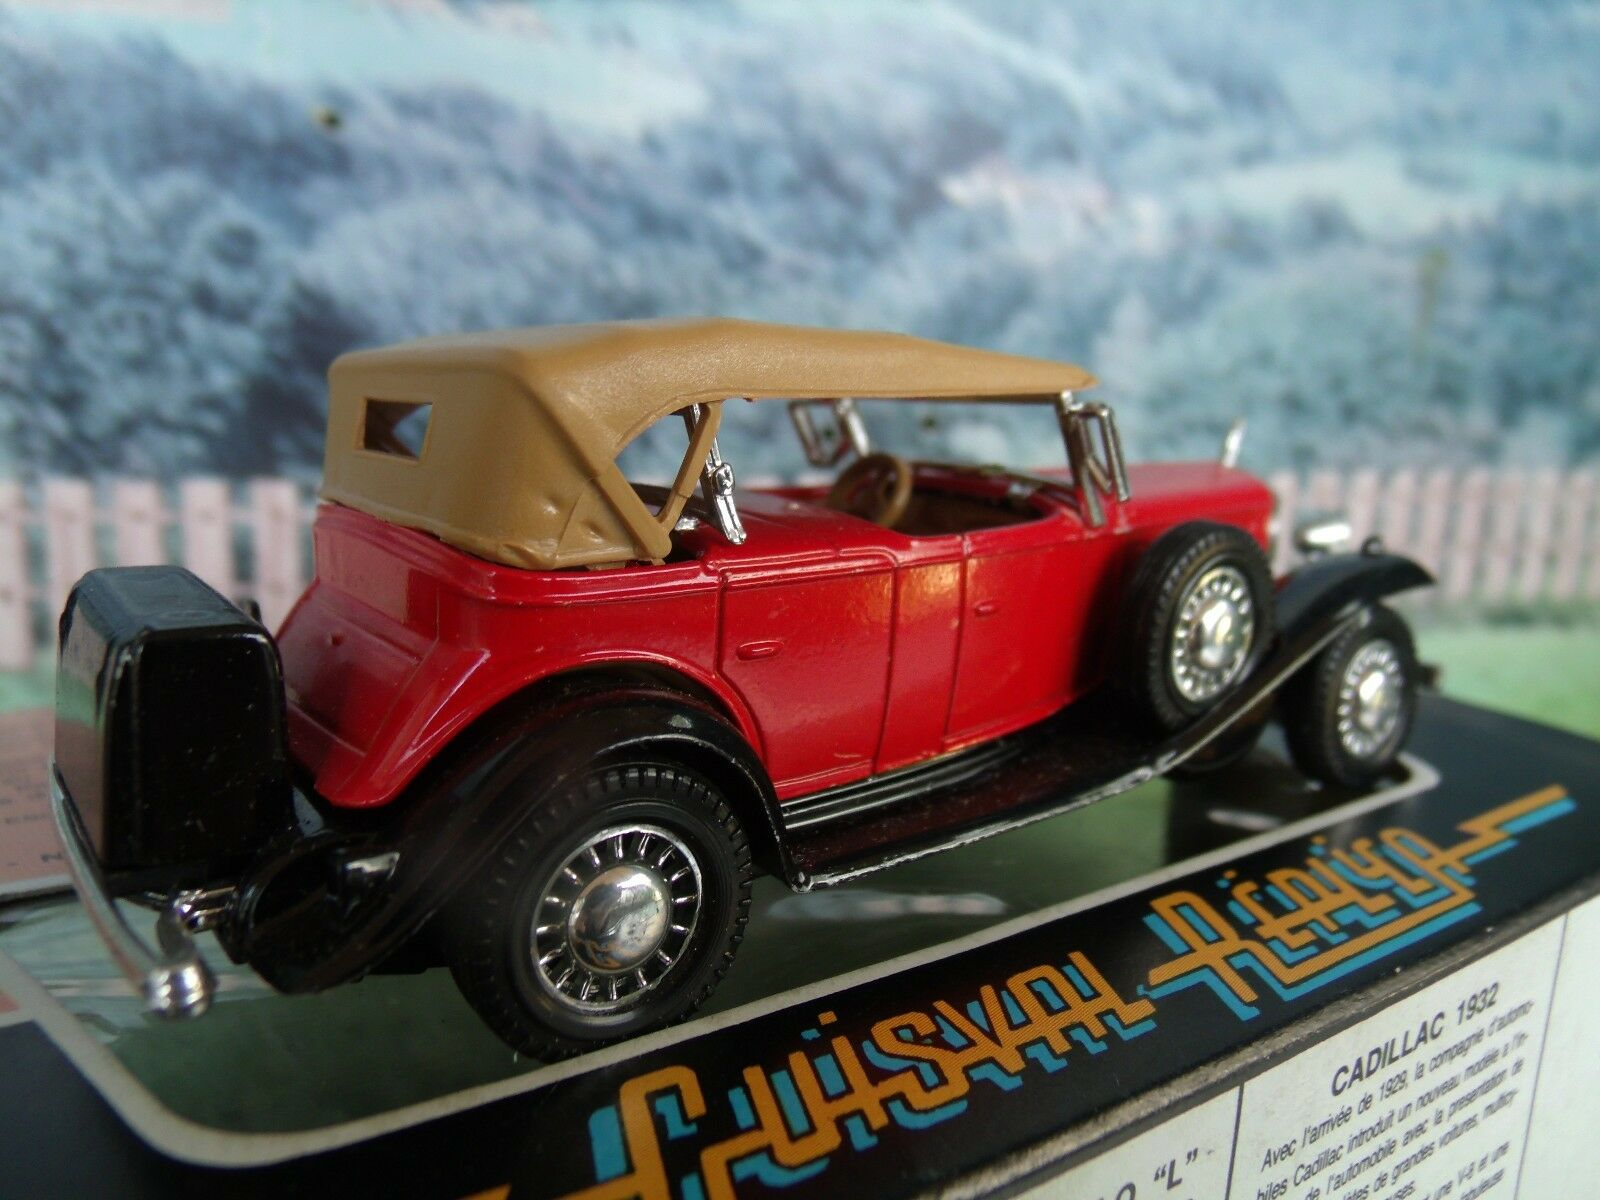 Guisval (spanien) cadillac 1932 v-16 1932 cadillac 1f28d4